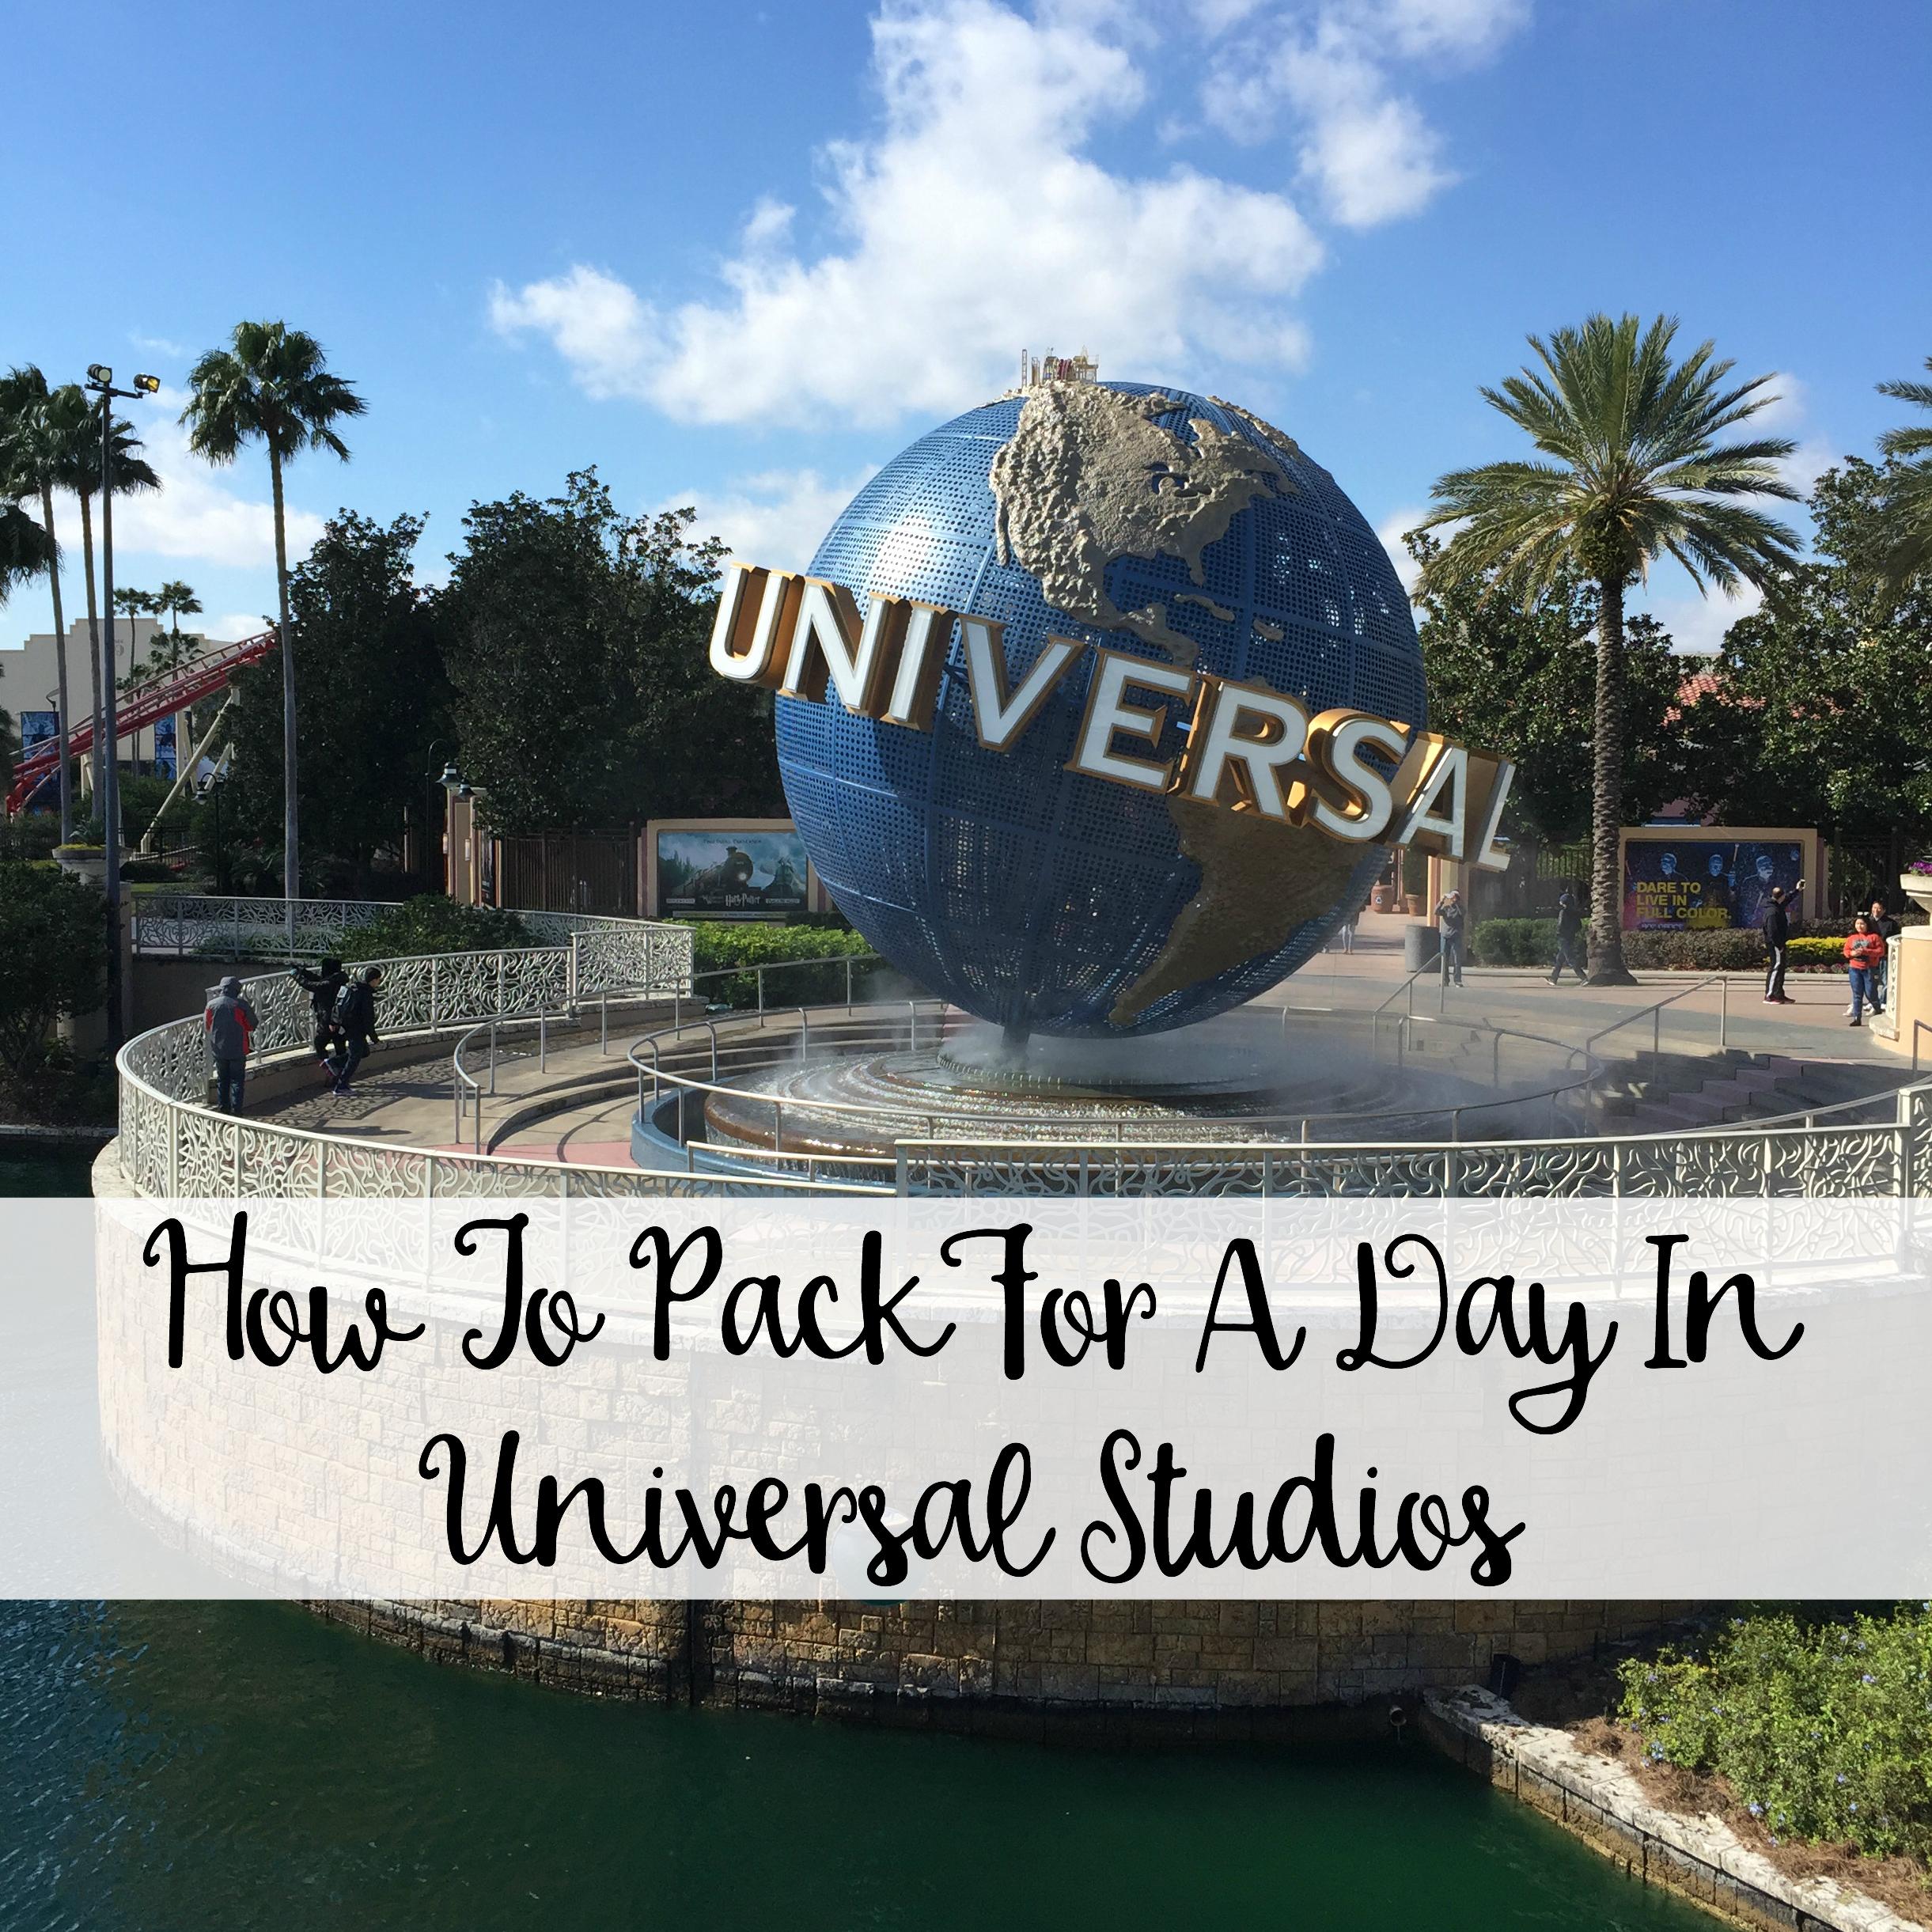 Can I Bring Food Into Universal Studios Florida